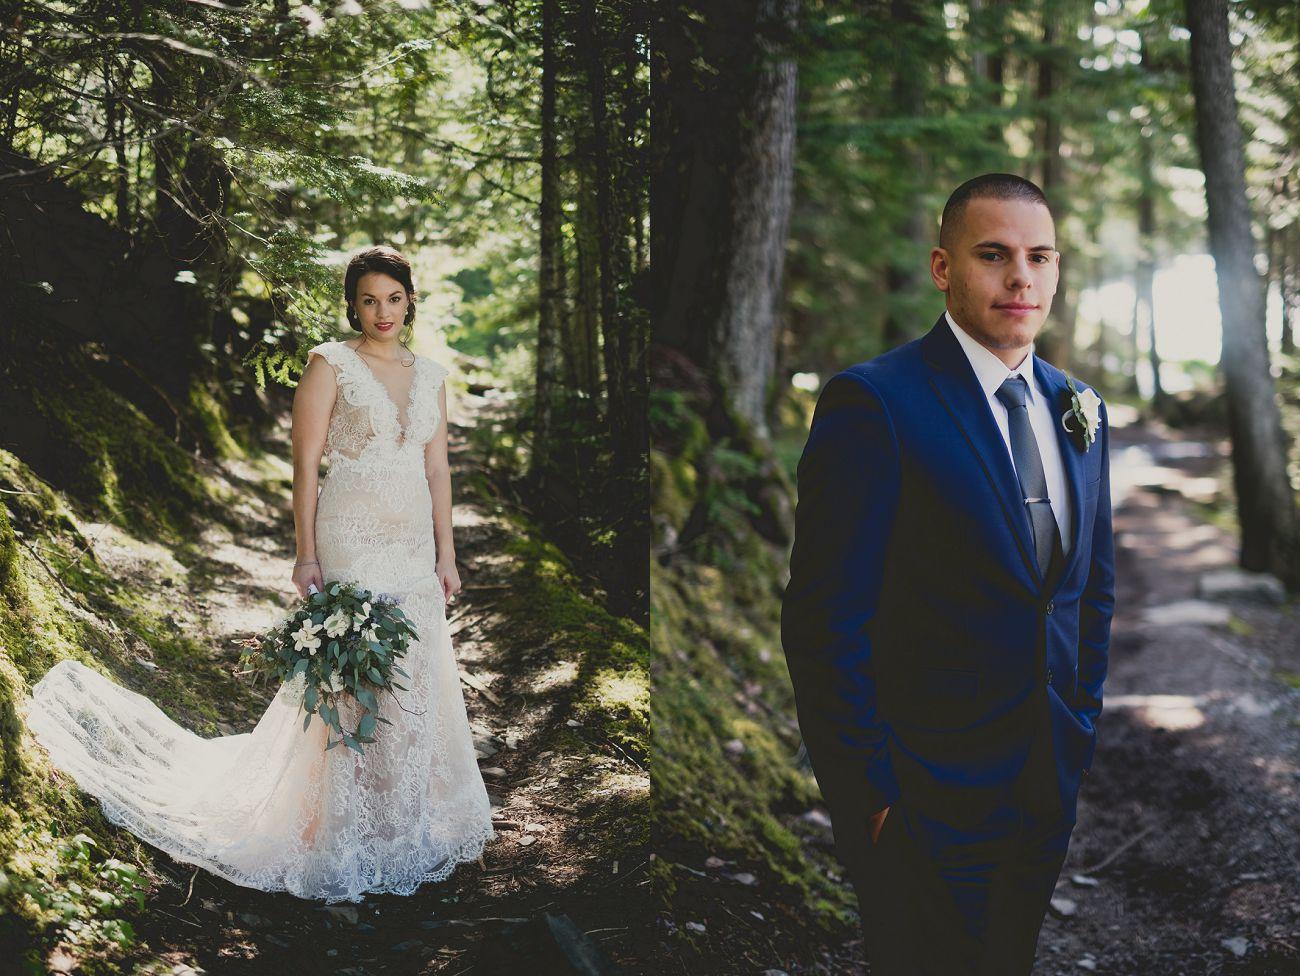 Jennifer_Mooney_Photo_Glacier_Park_Weddings_Elopement_00054.jpg